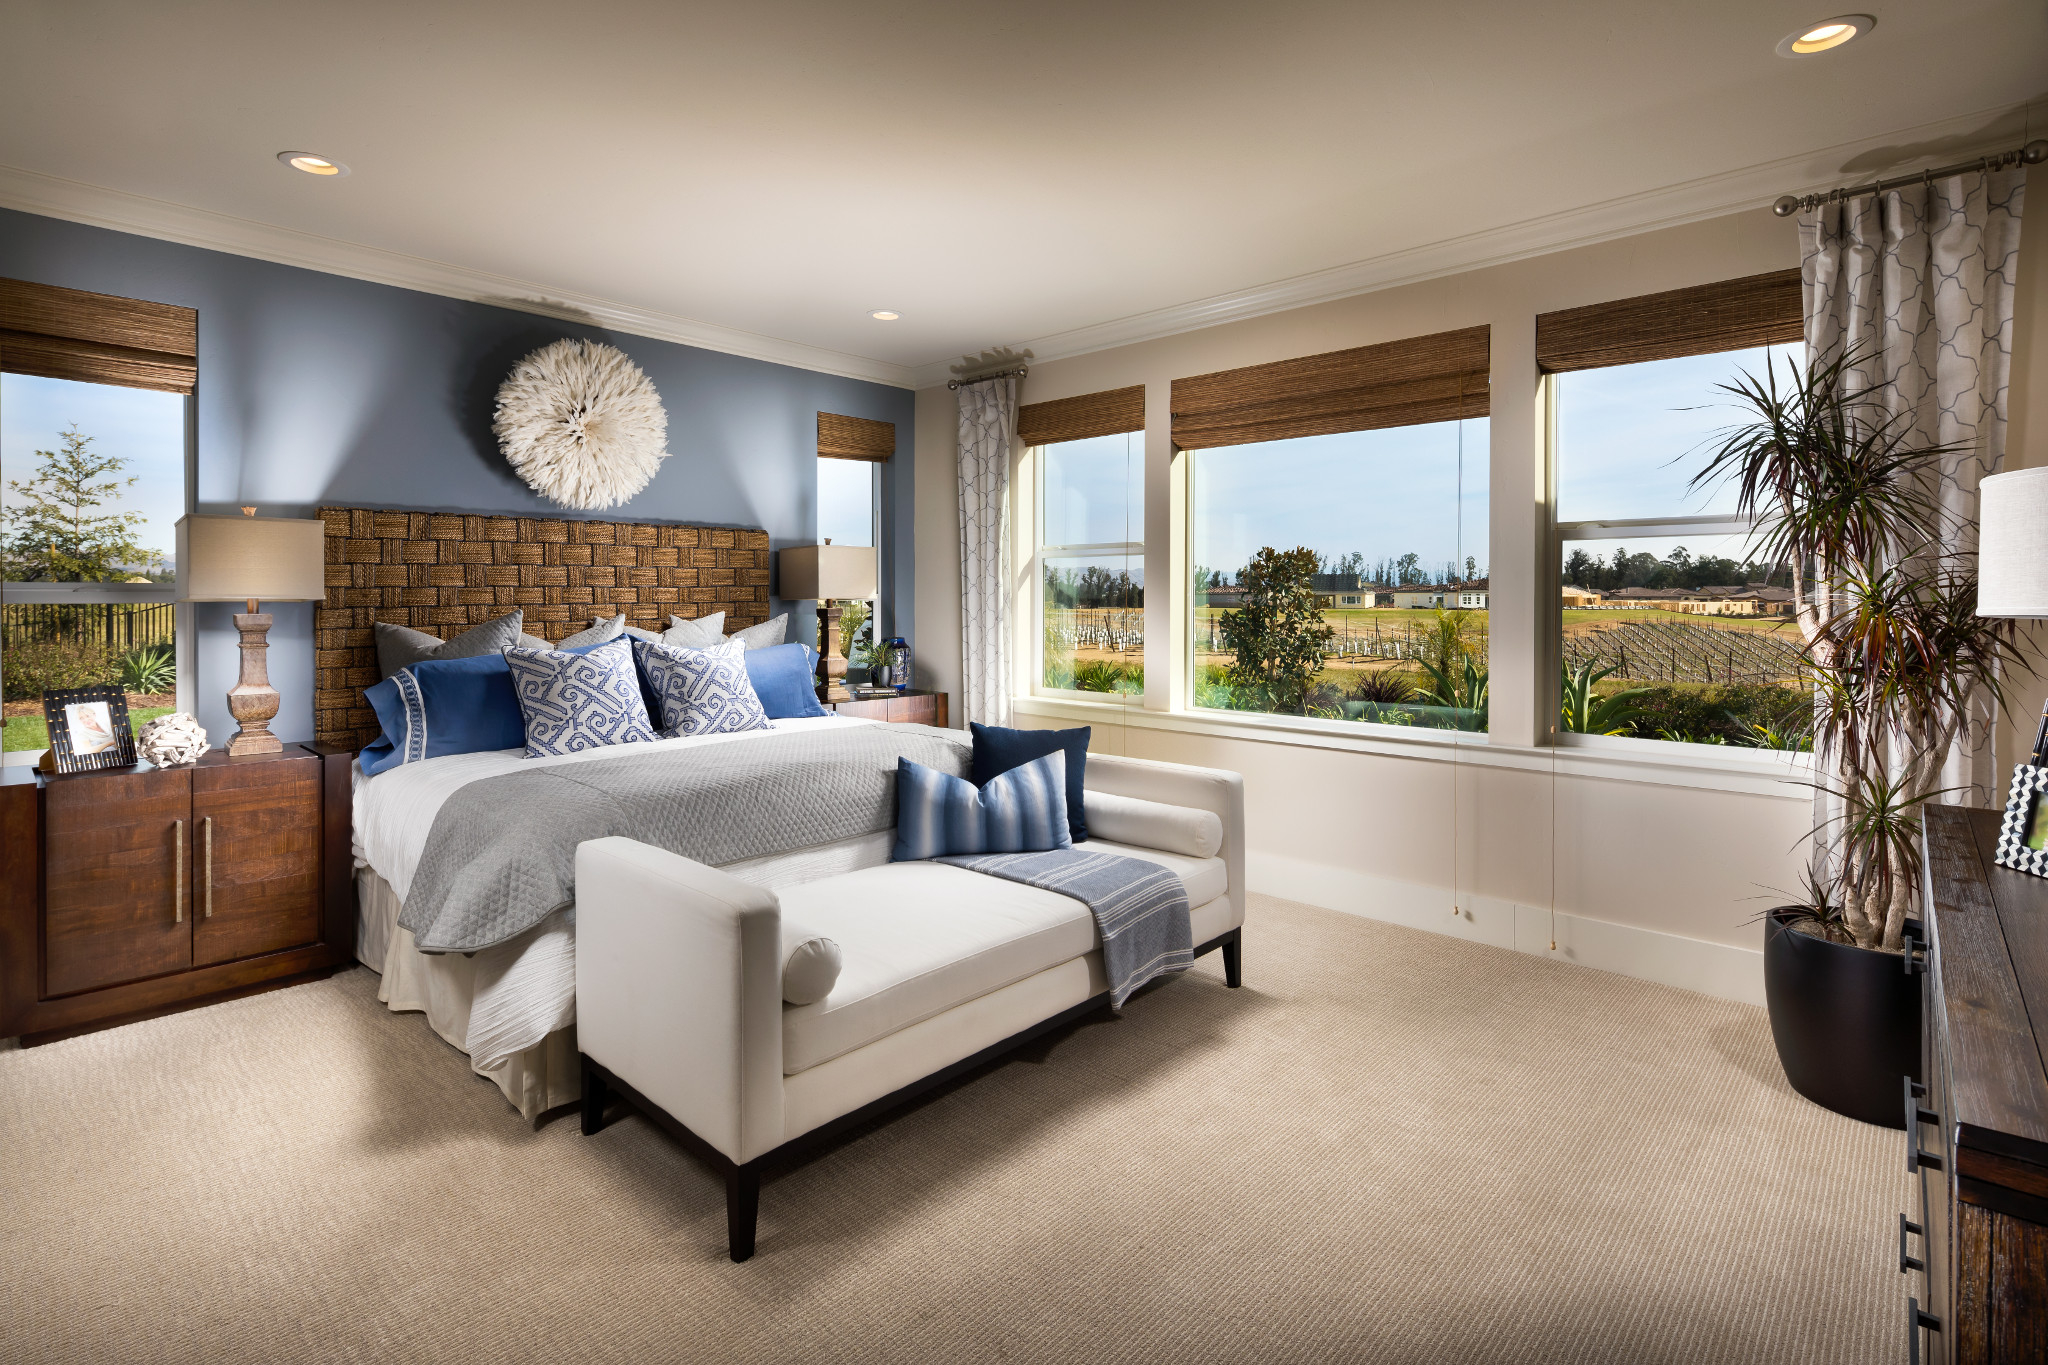 Trilogy Monarch Dunes Solvang Master Bedroom